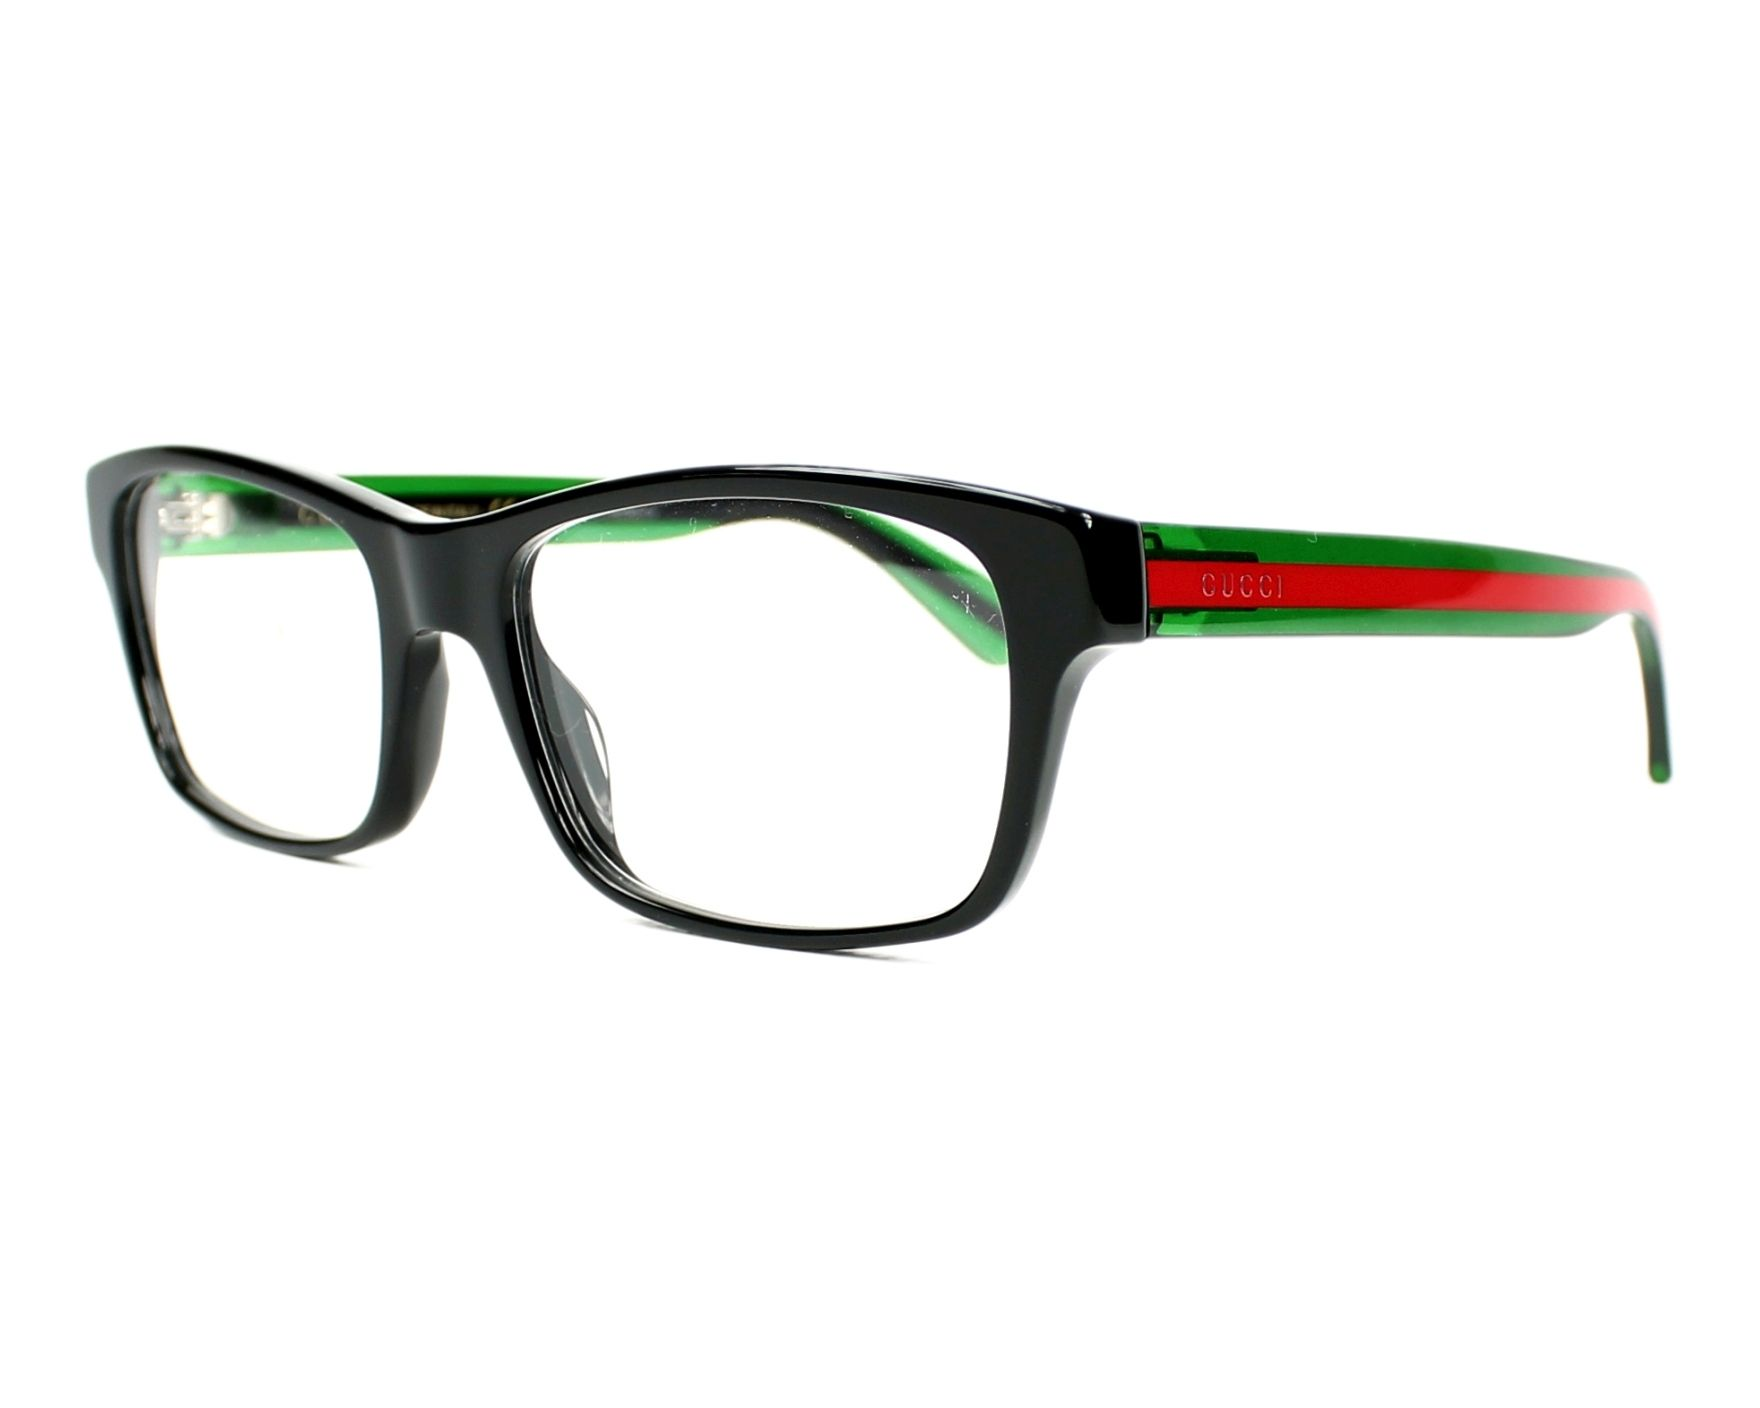 284f0add35 eyeglasses Gucci GG-0006-O 006 55-18 Black Green profile view